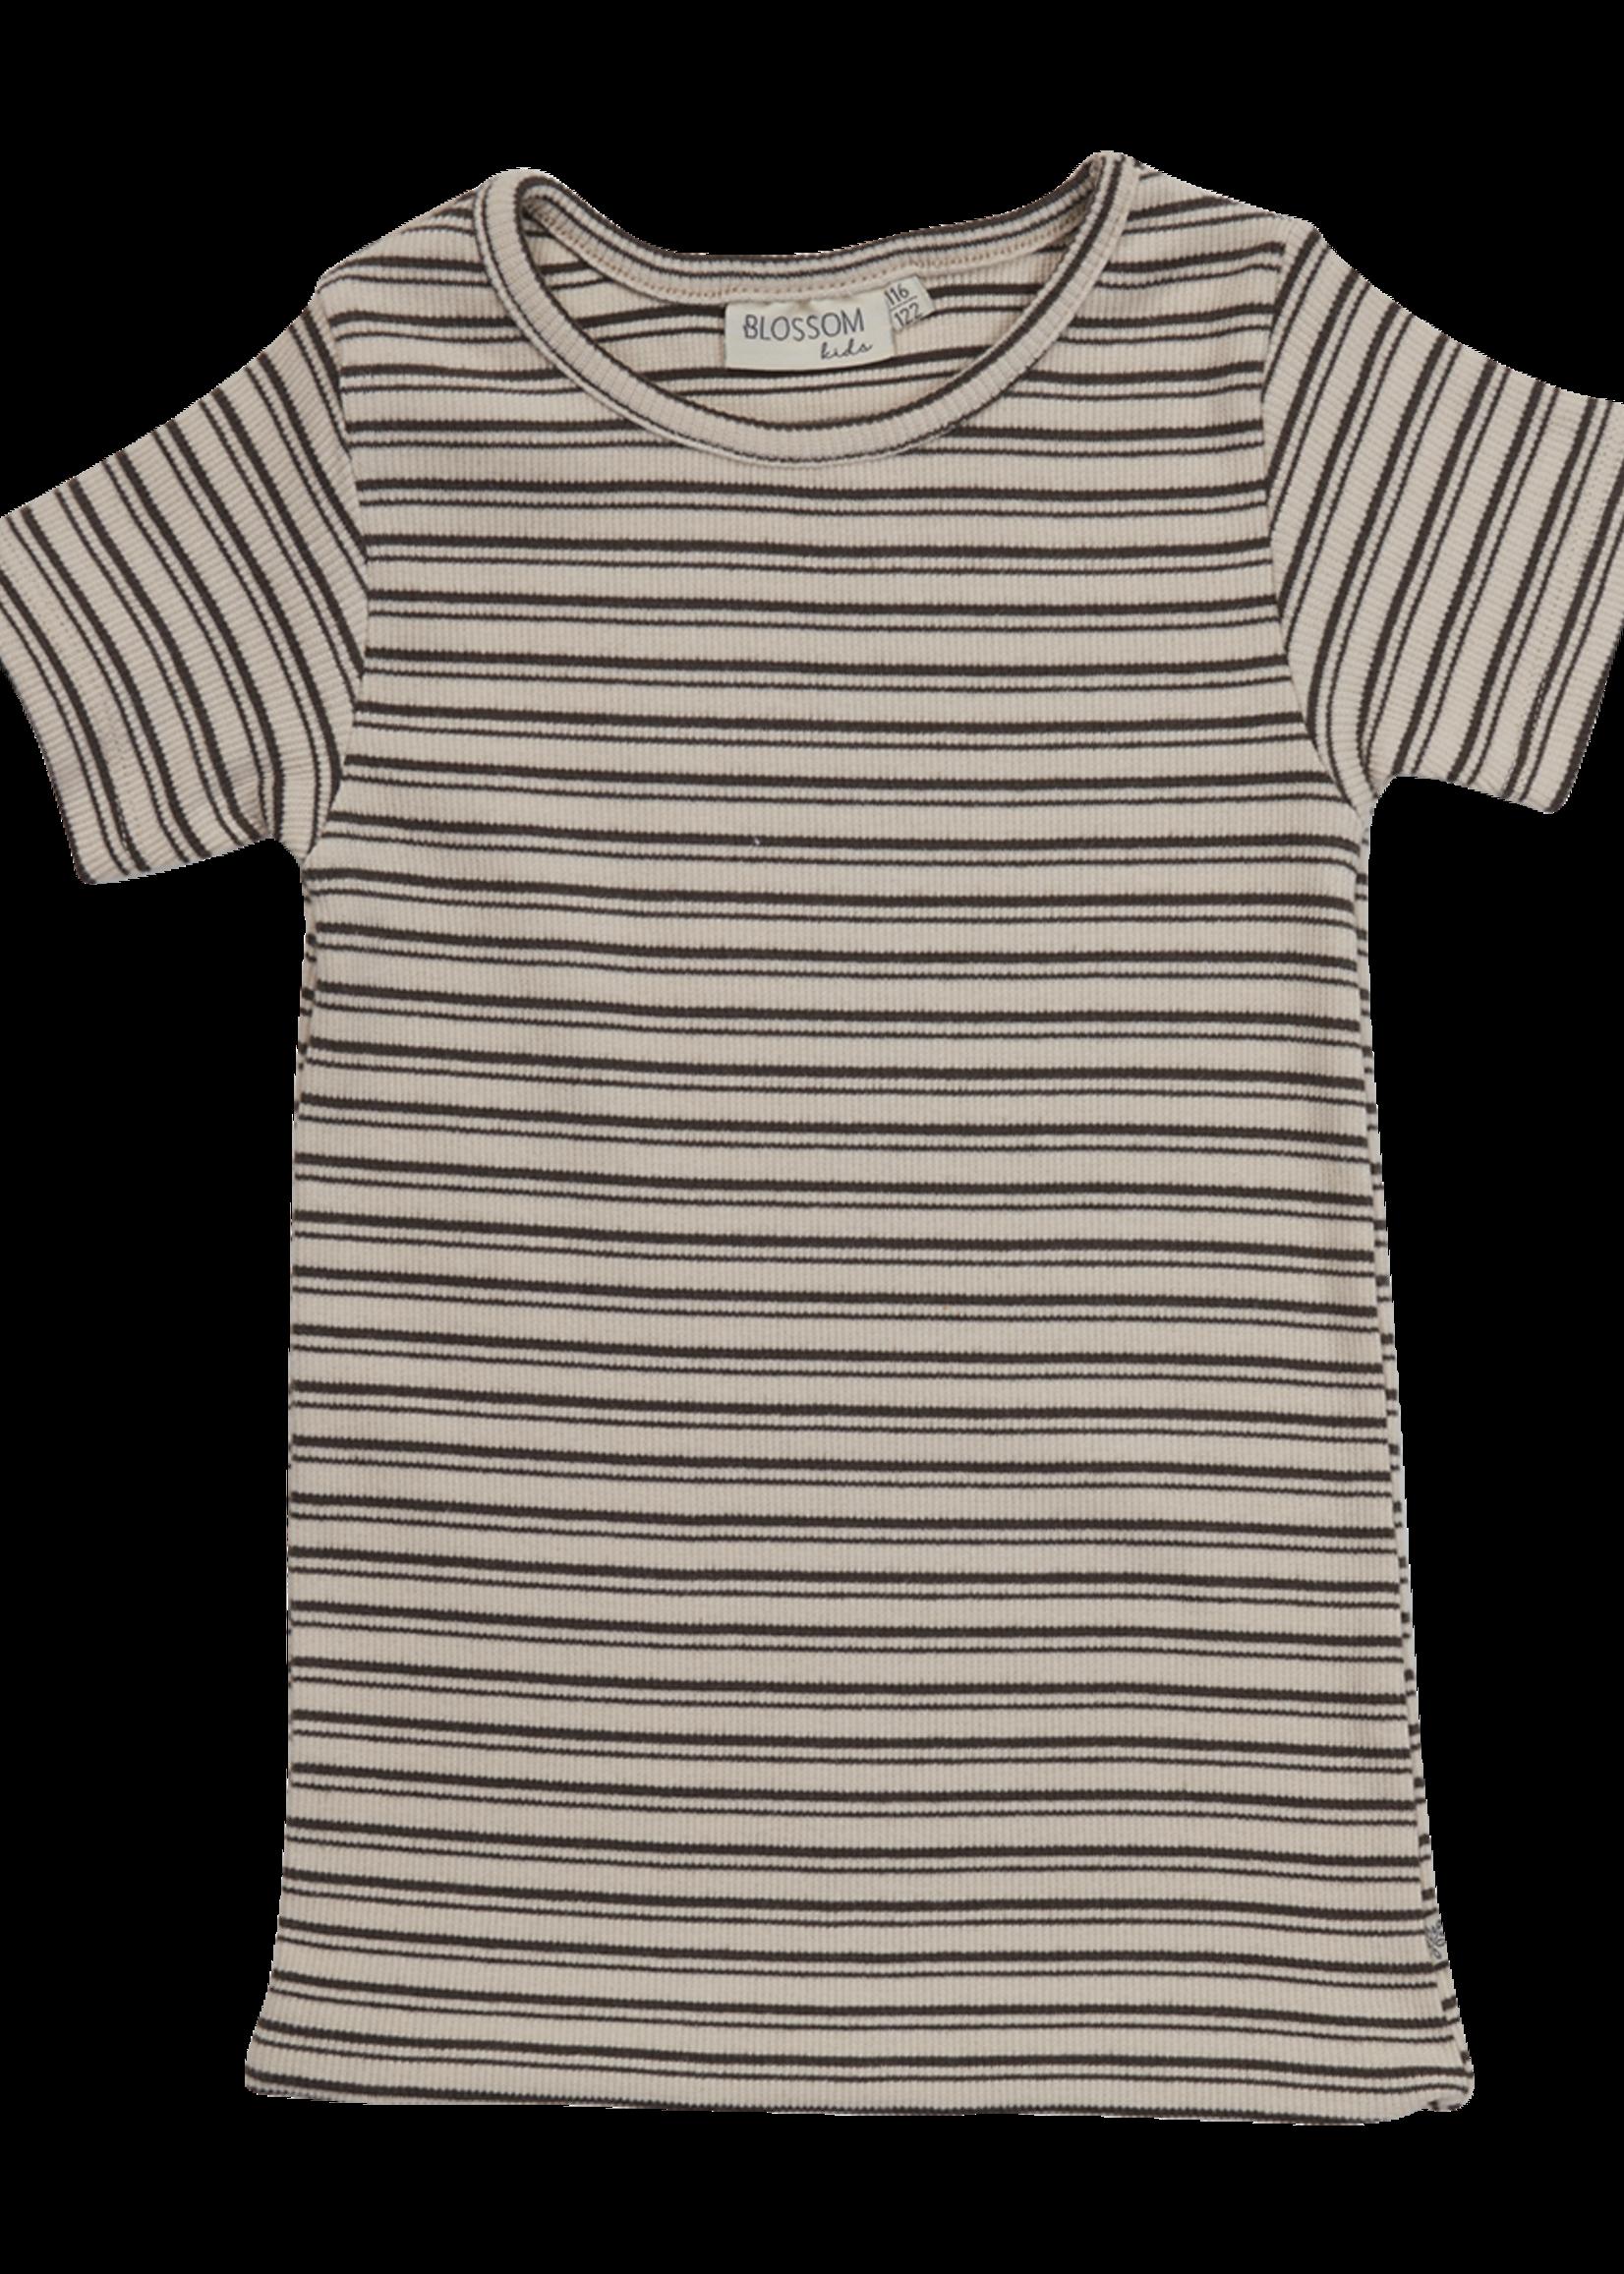 Blossom Kids BK - Short sleeve shirt - Stripes - Cinnamon